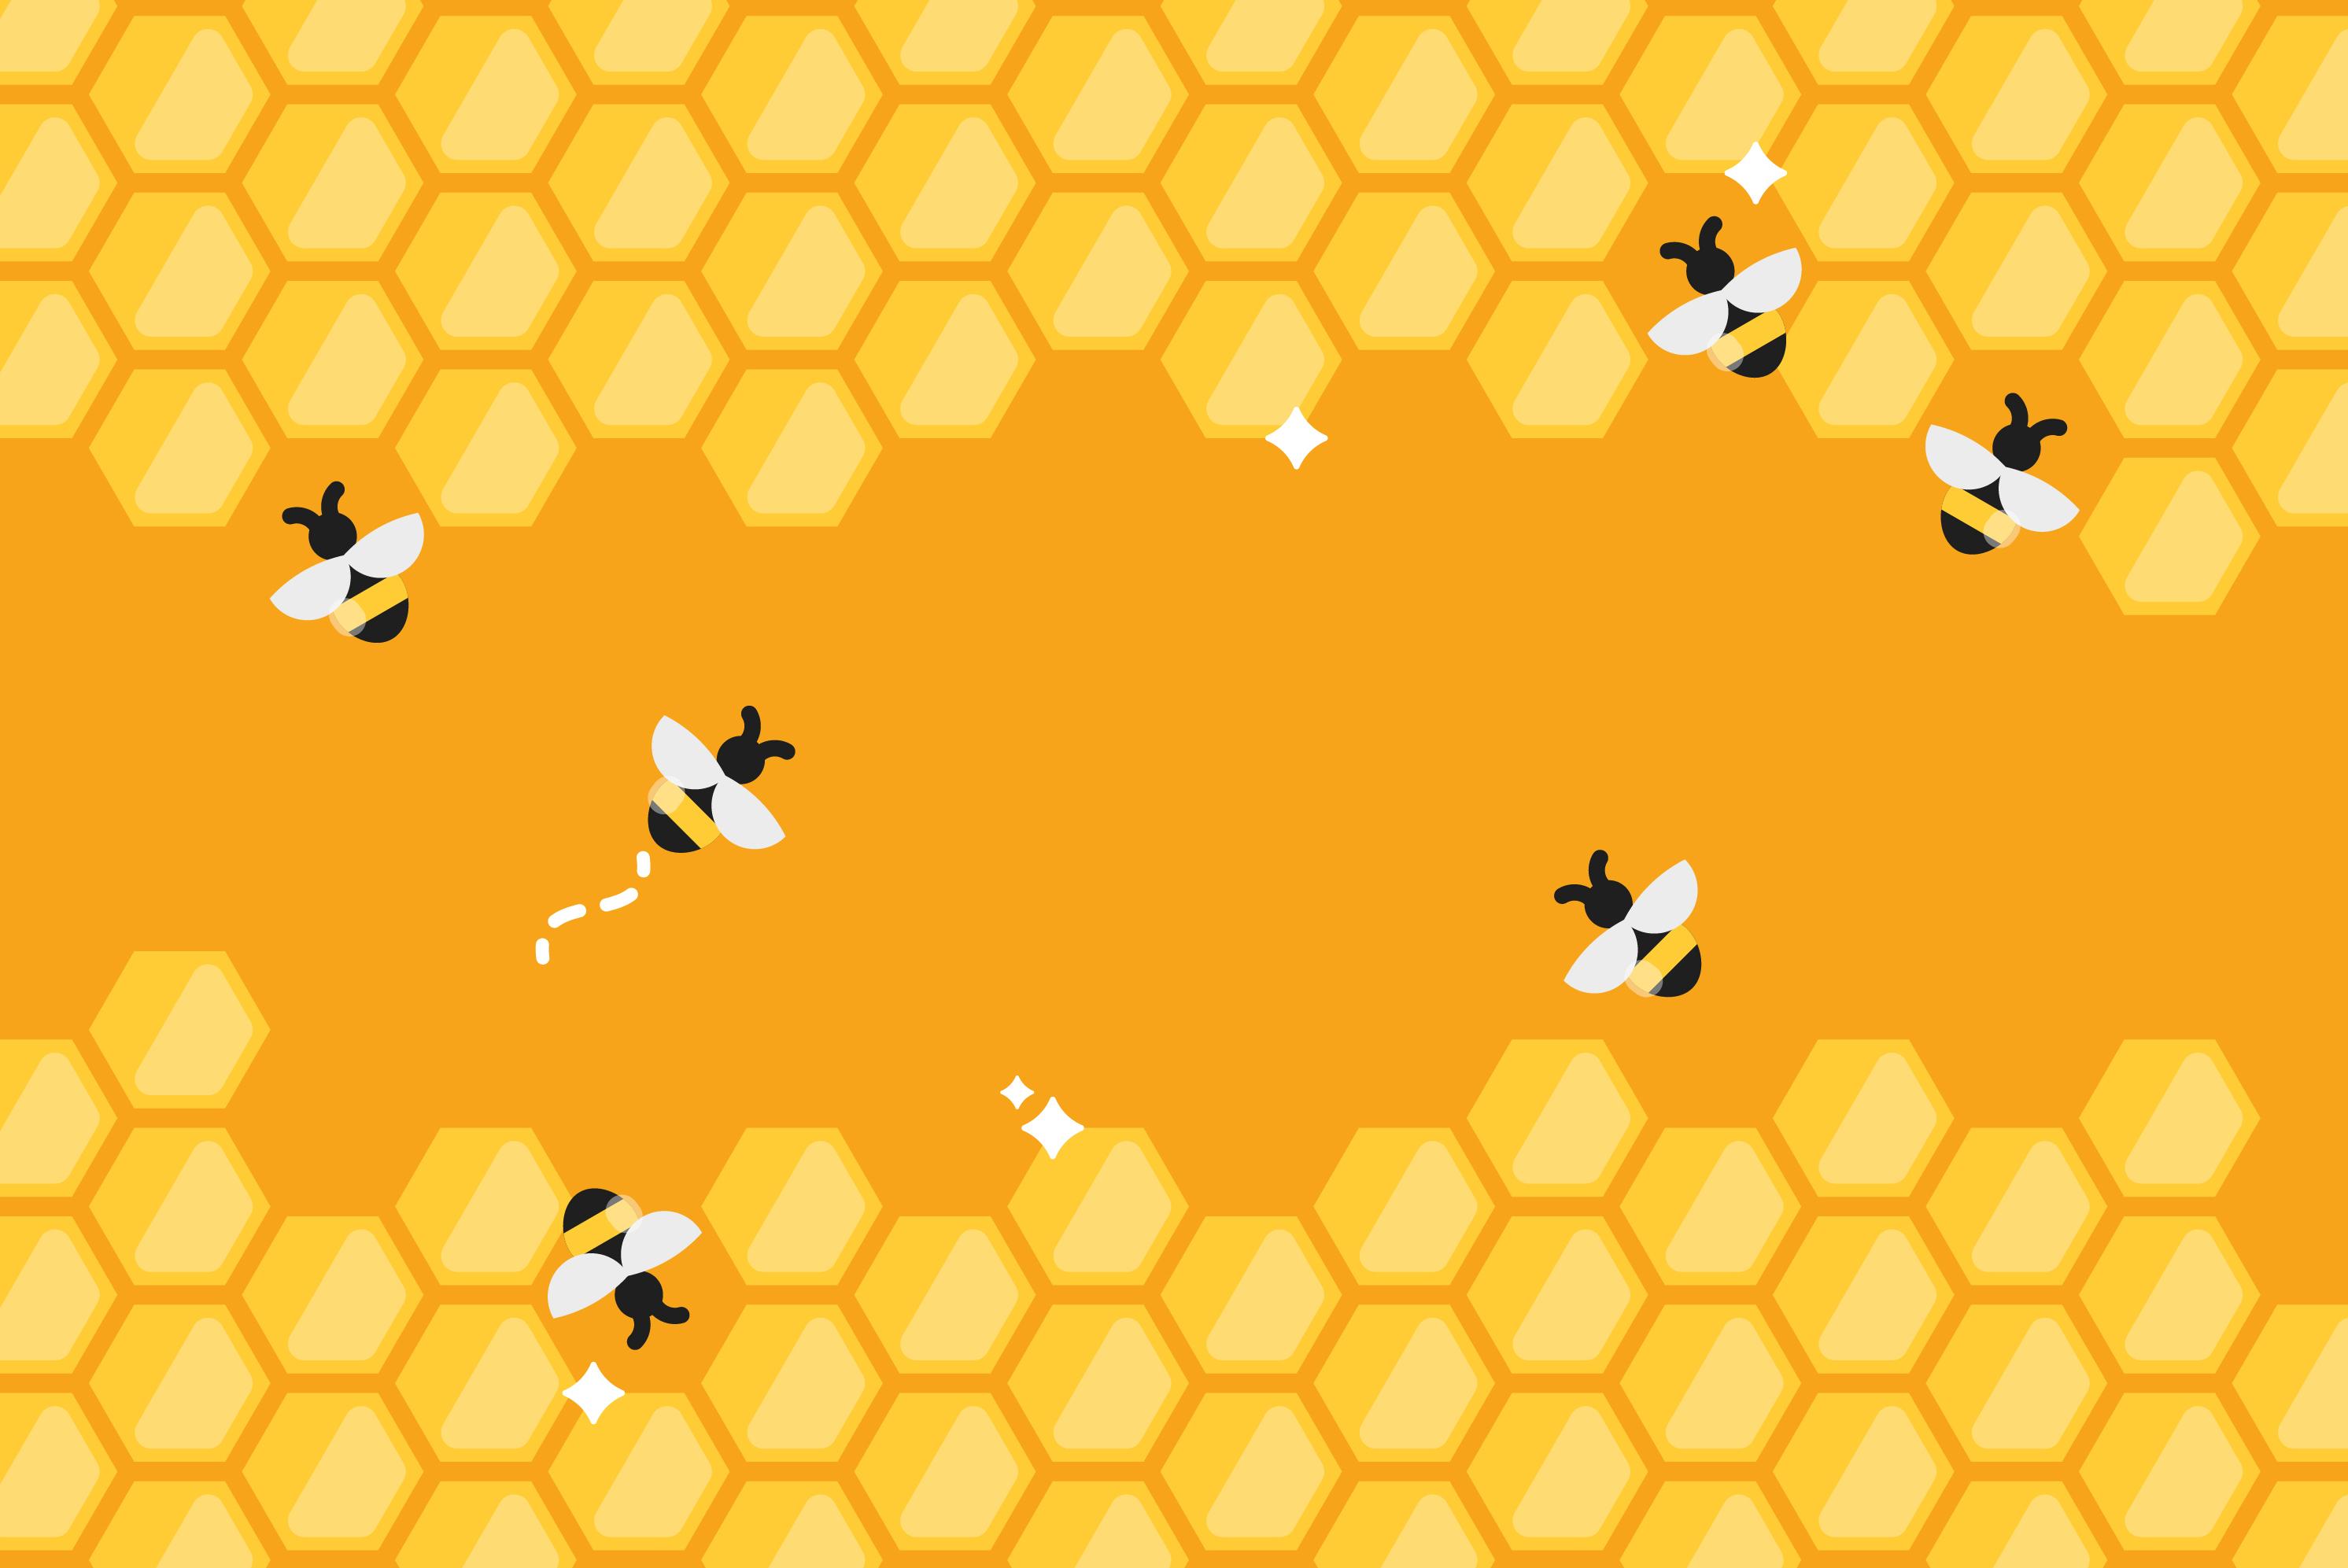 Wallpaper red yellow beehive honeycomb hexagon #892100 ... |Yellow Honeycomb Wallpaper